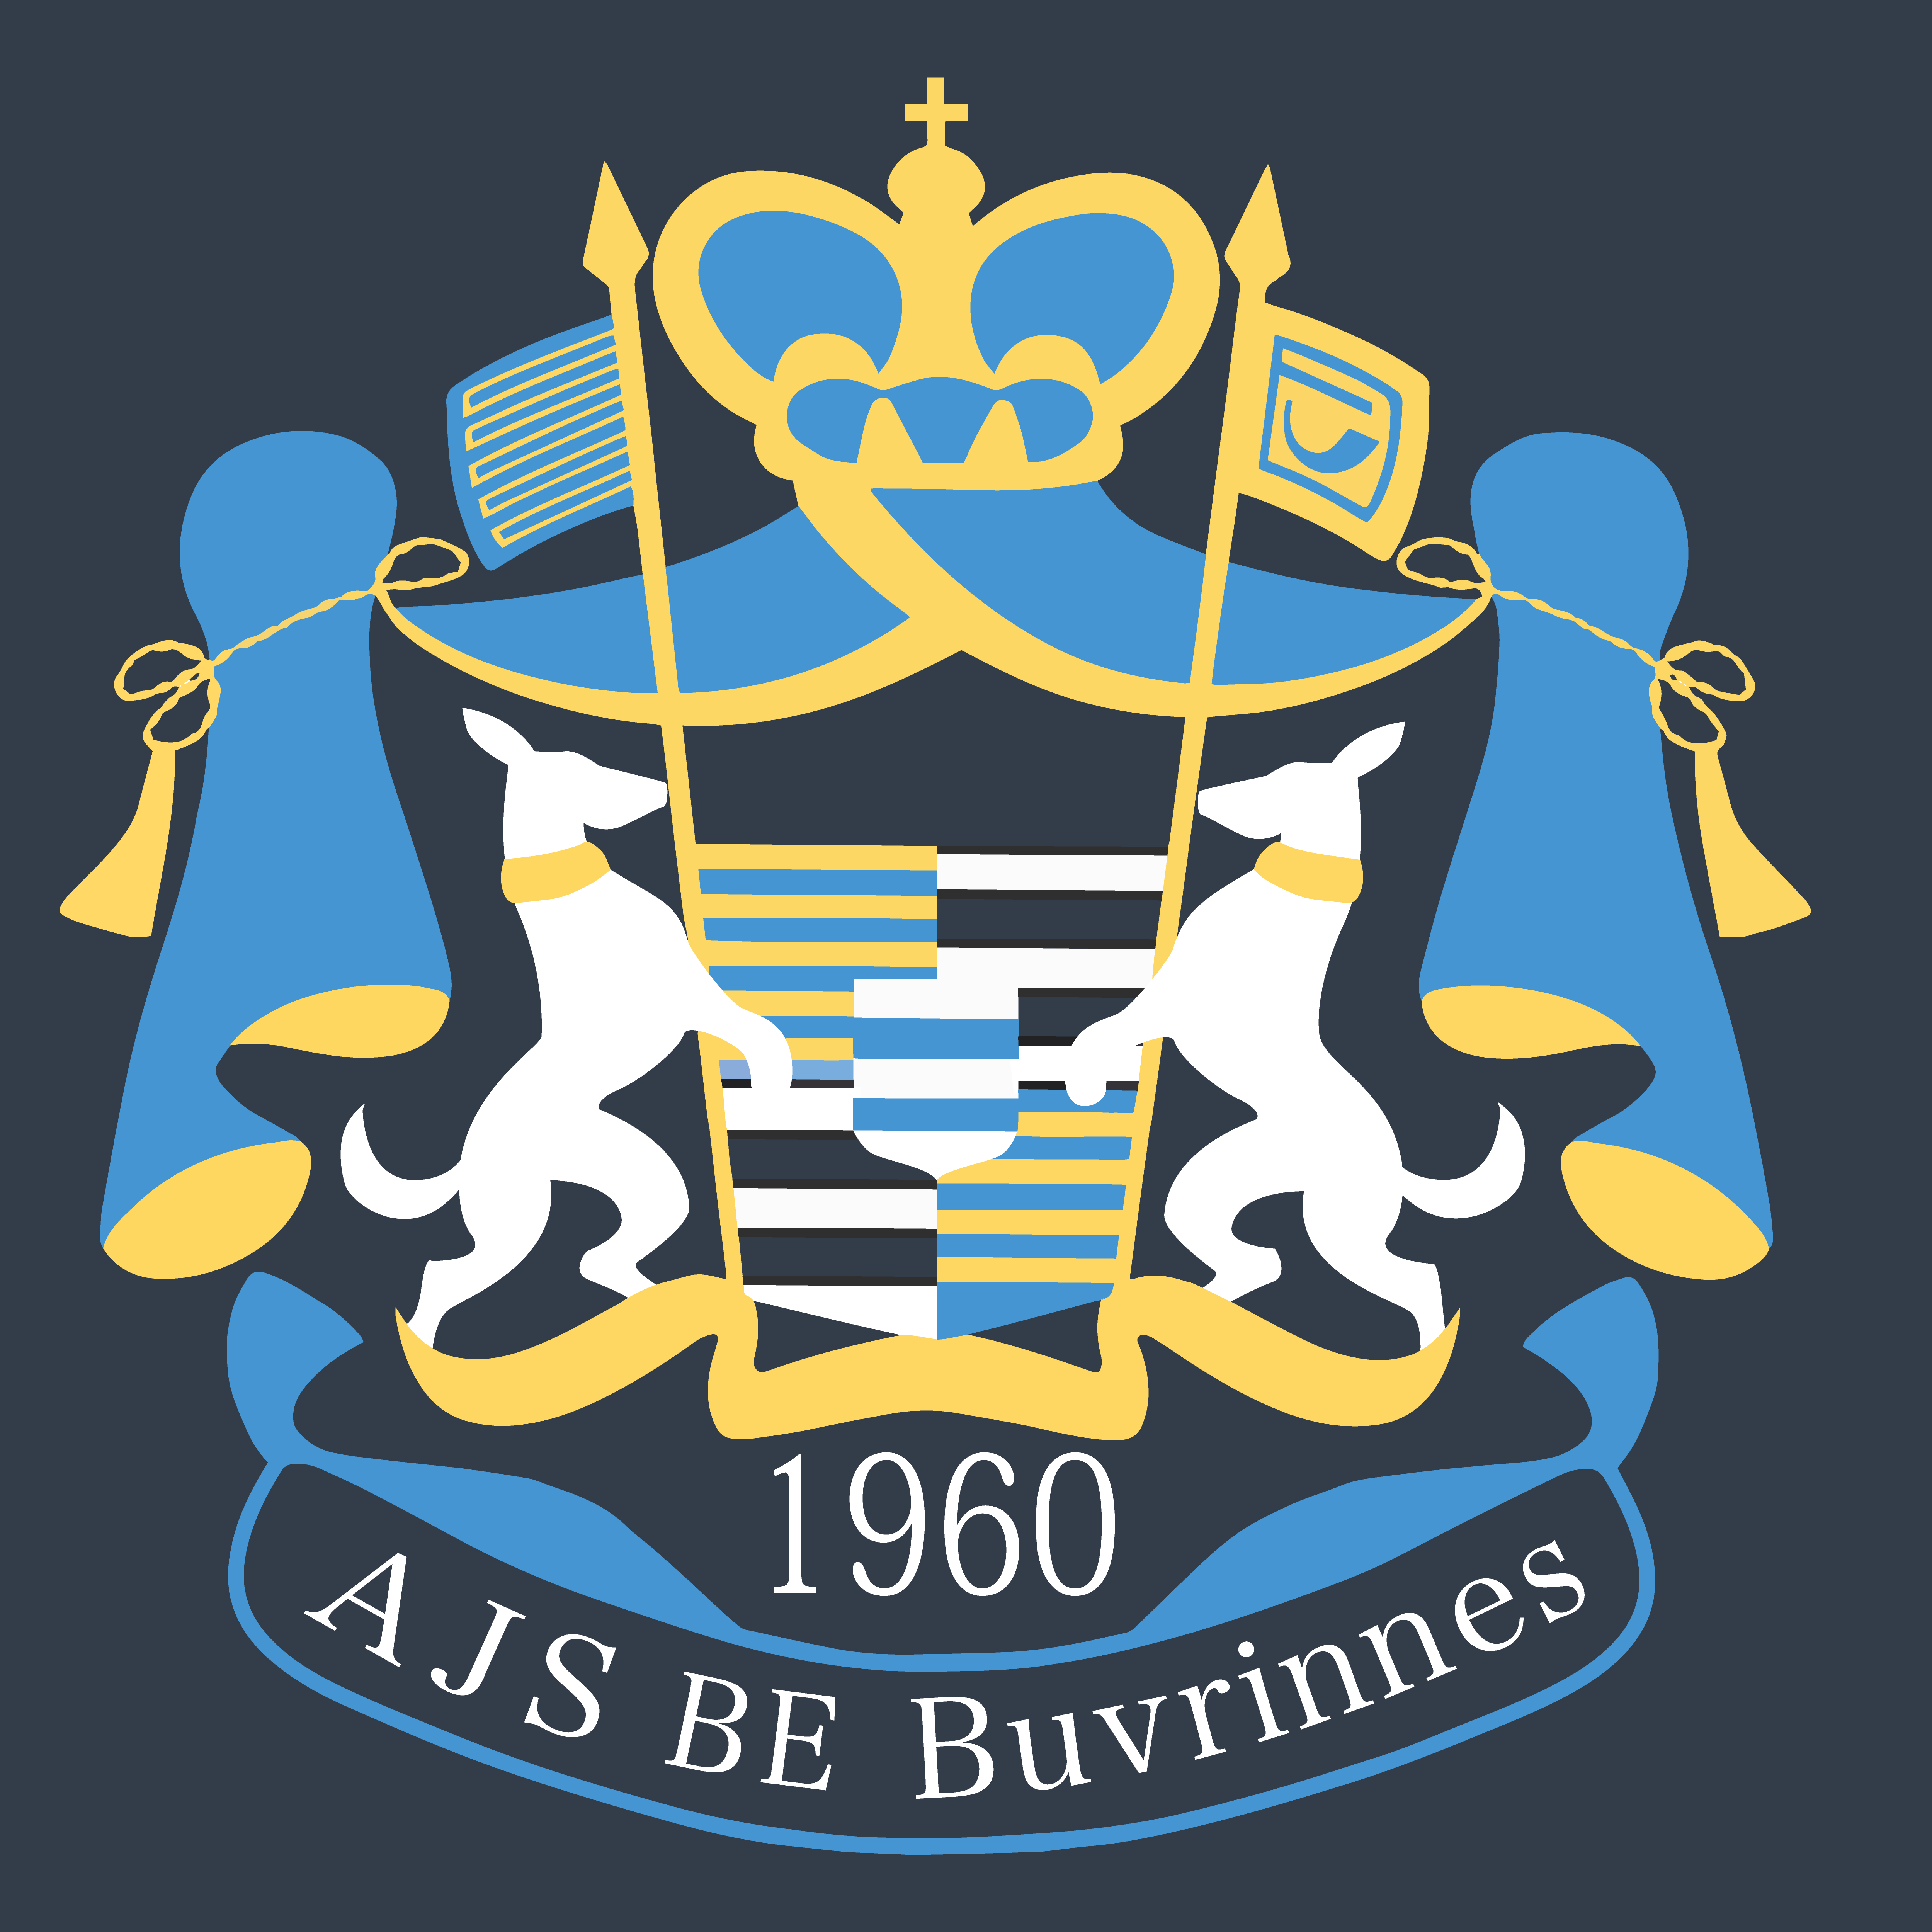 AJS Buvrinnes U11